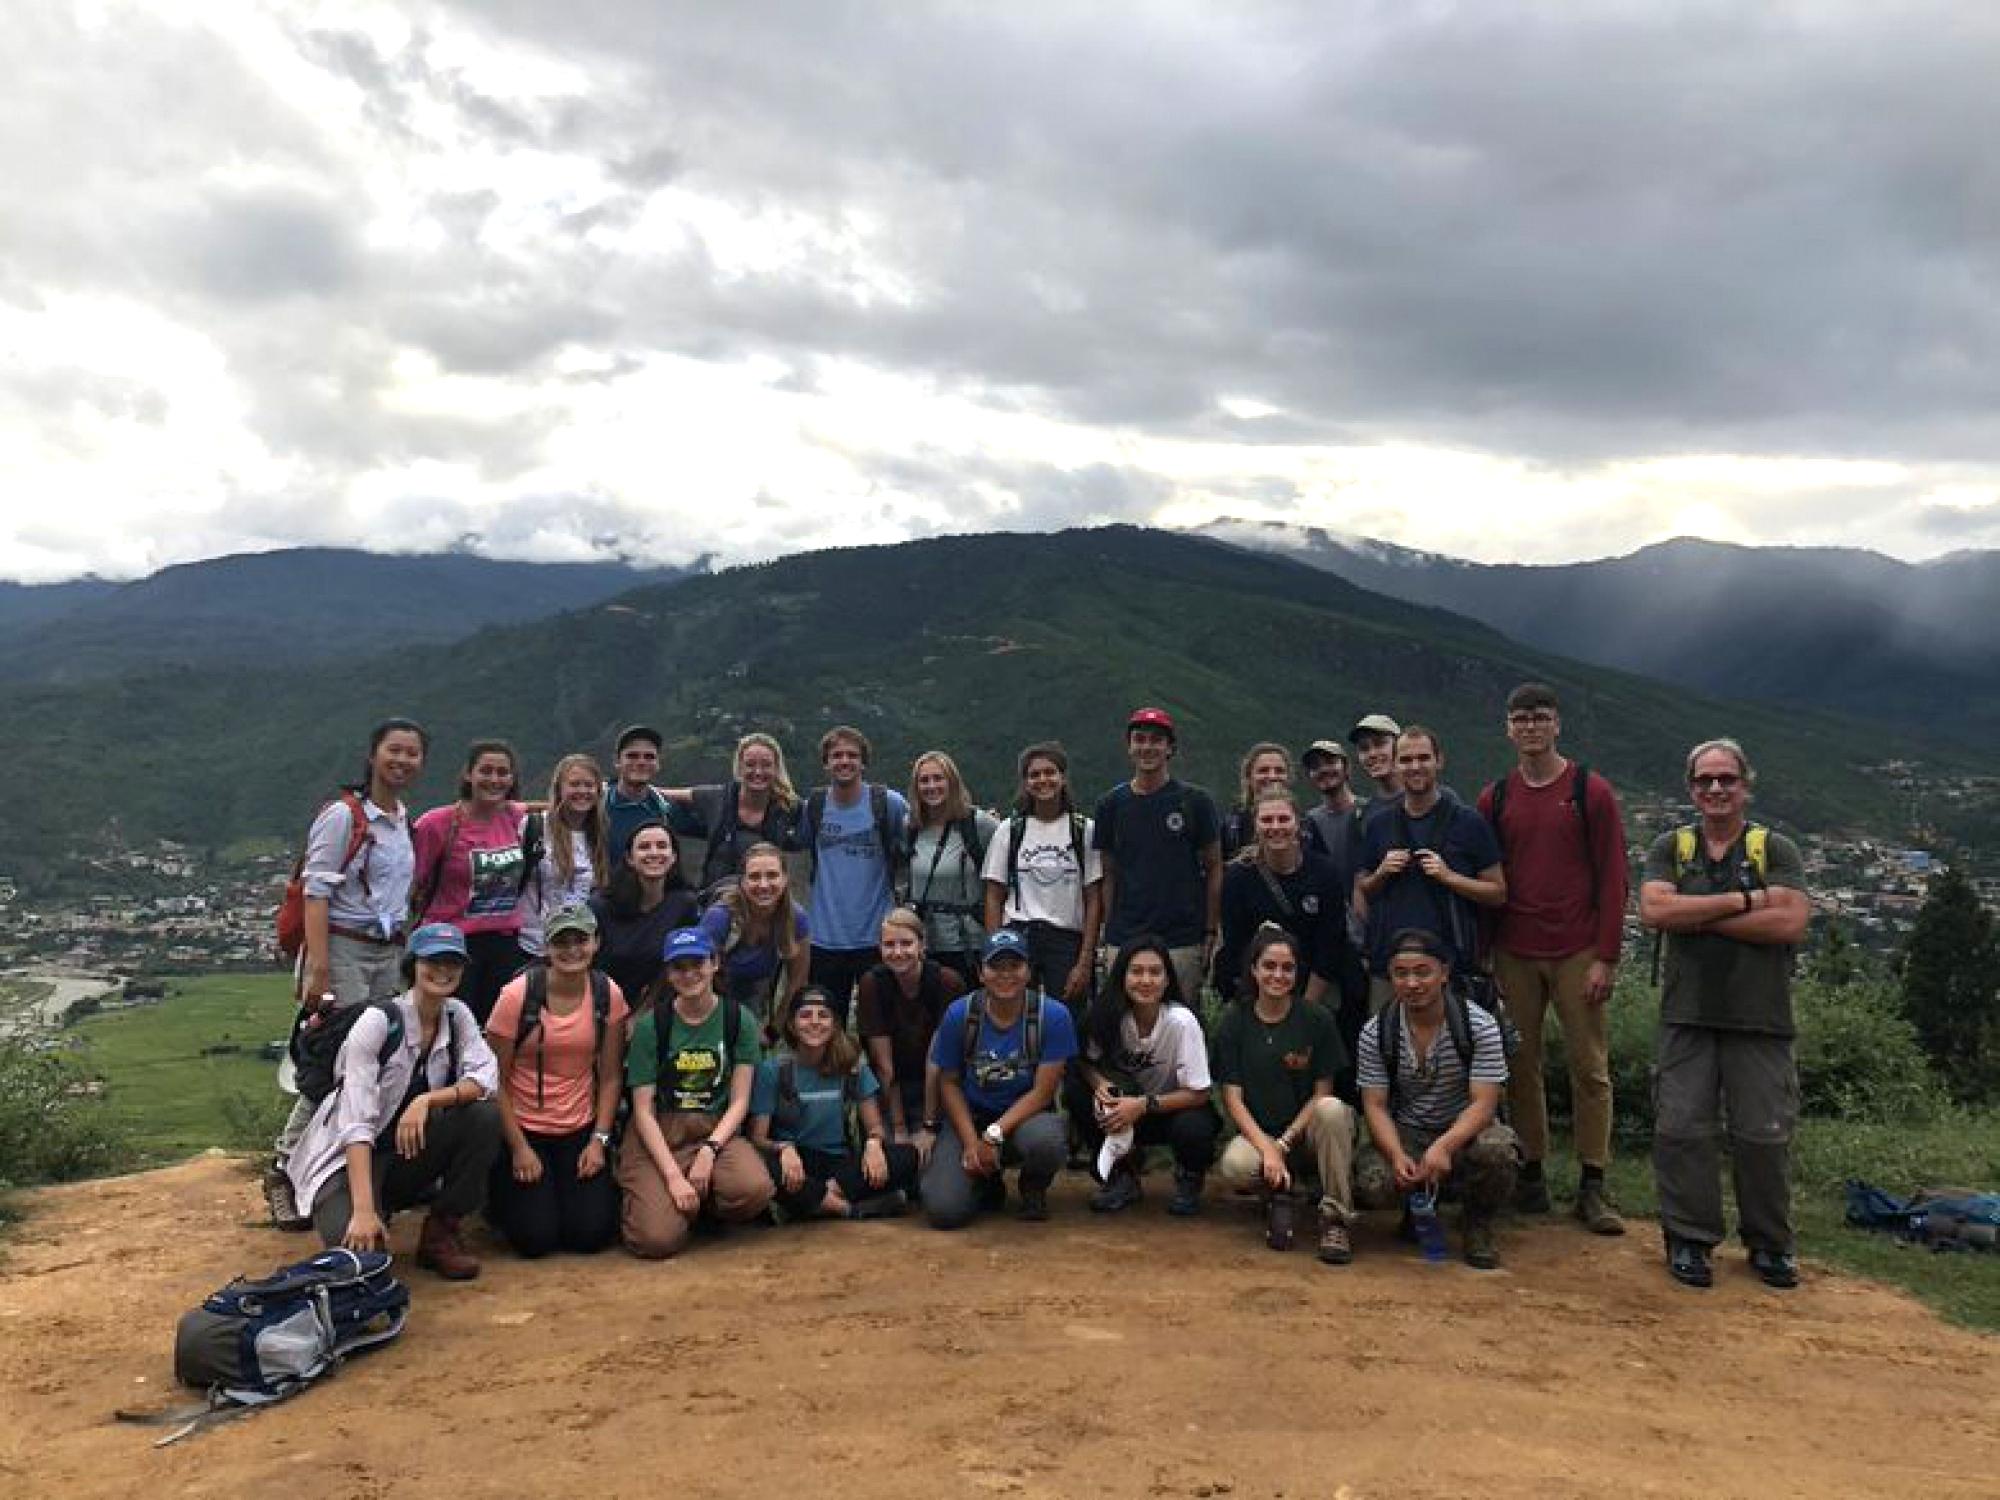 The School for Field Studies (SFS) 2019 Fall Semester Program Begins